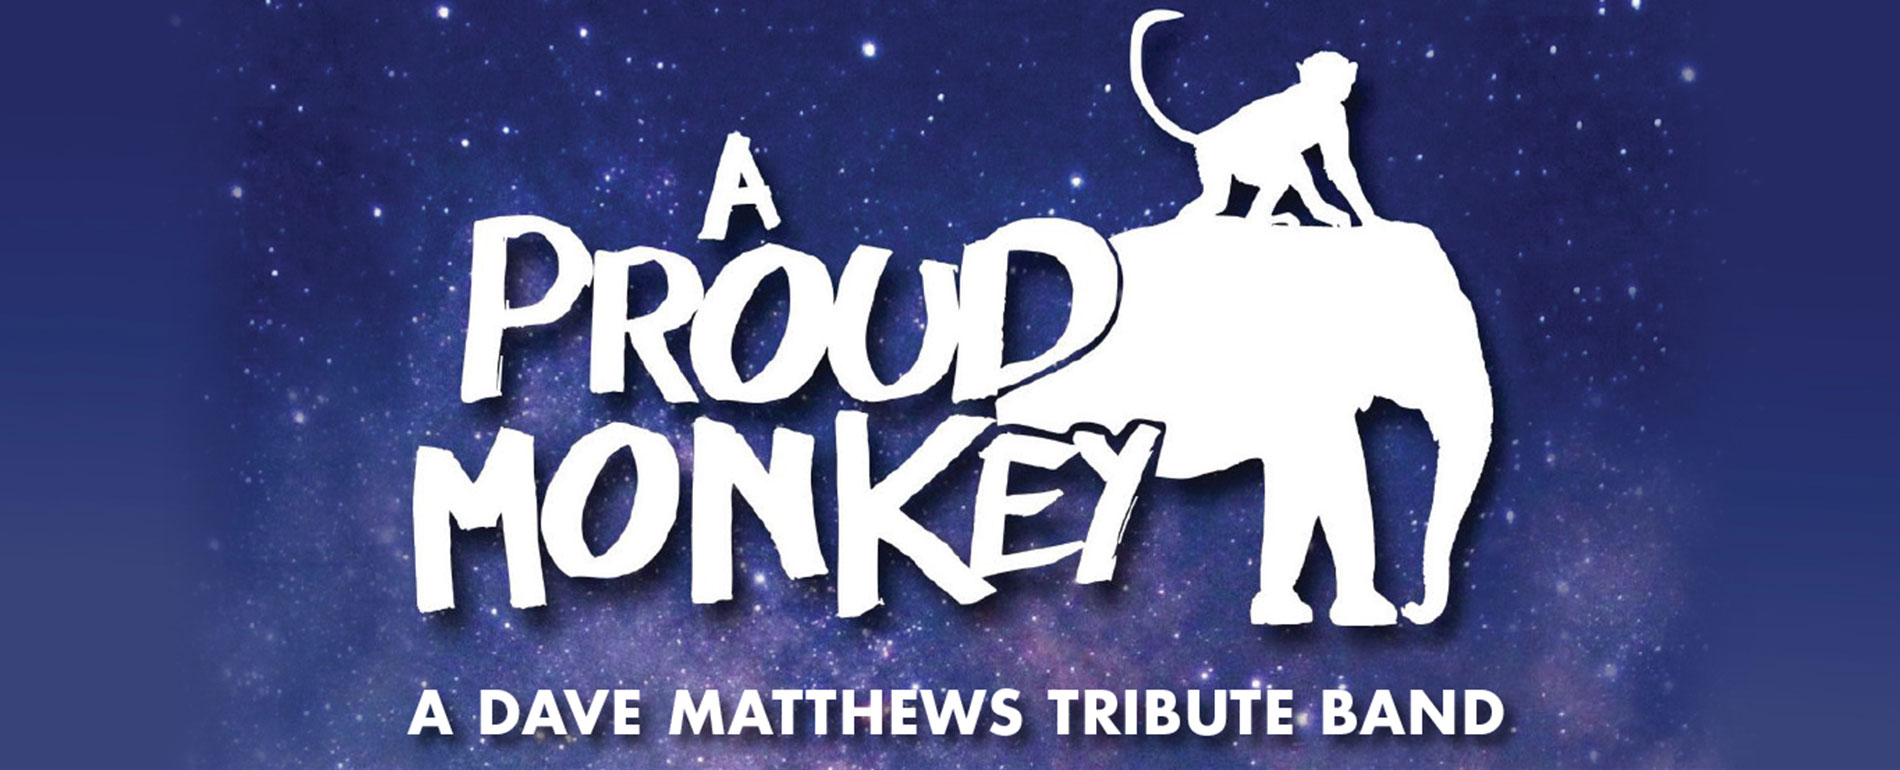 Pocono Concert - A Proud Monkey